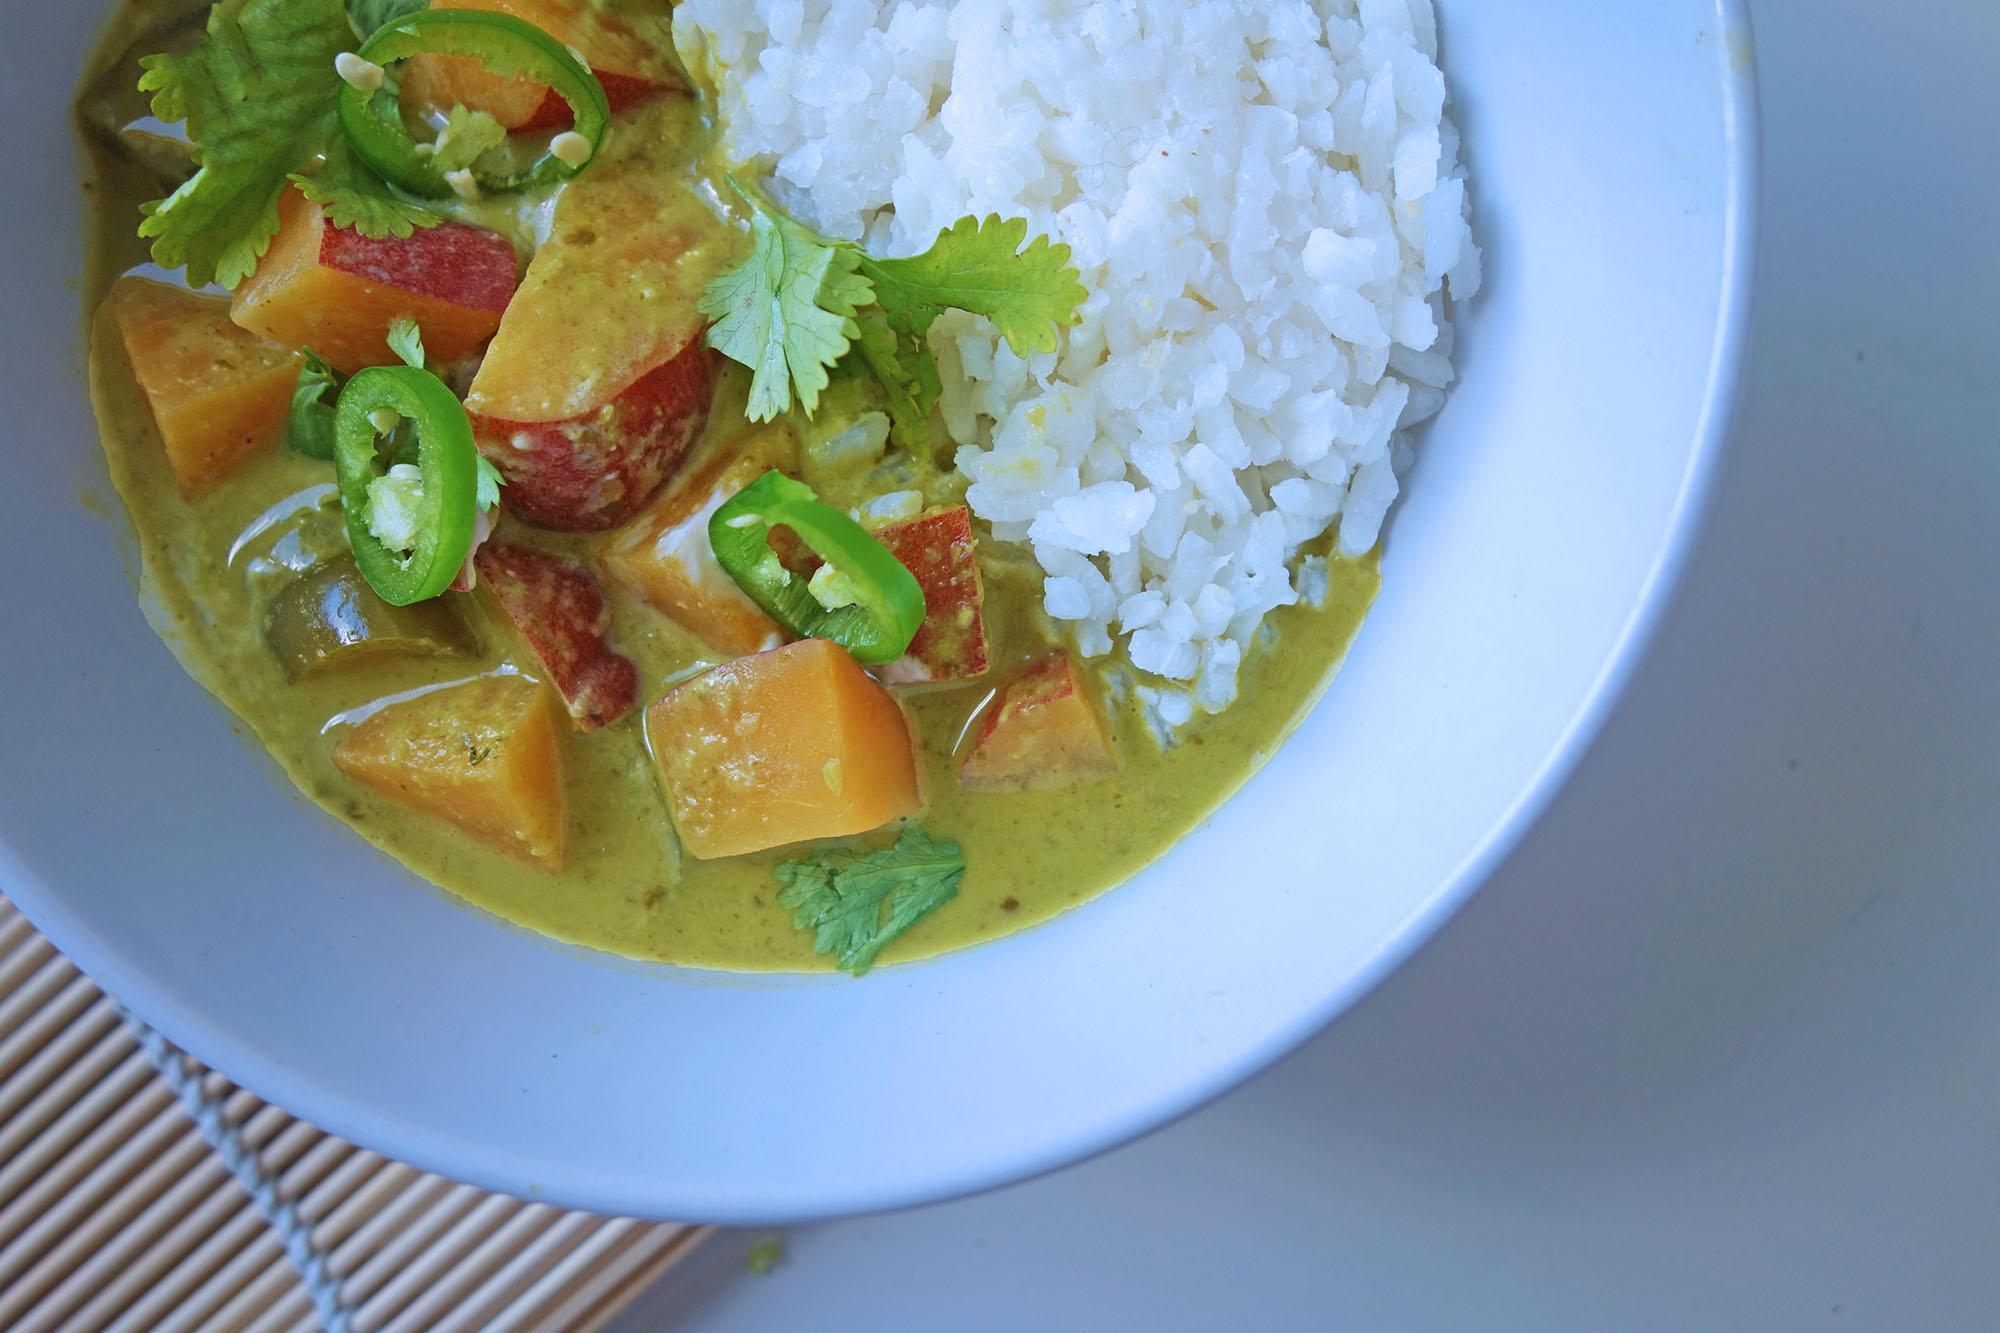 Sweet Potato Green Curry, Recipes, Curry , ideas, recipes, how to make, cook, thai, tess ward